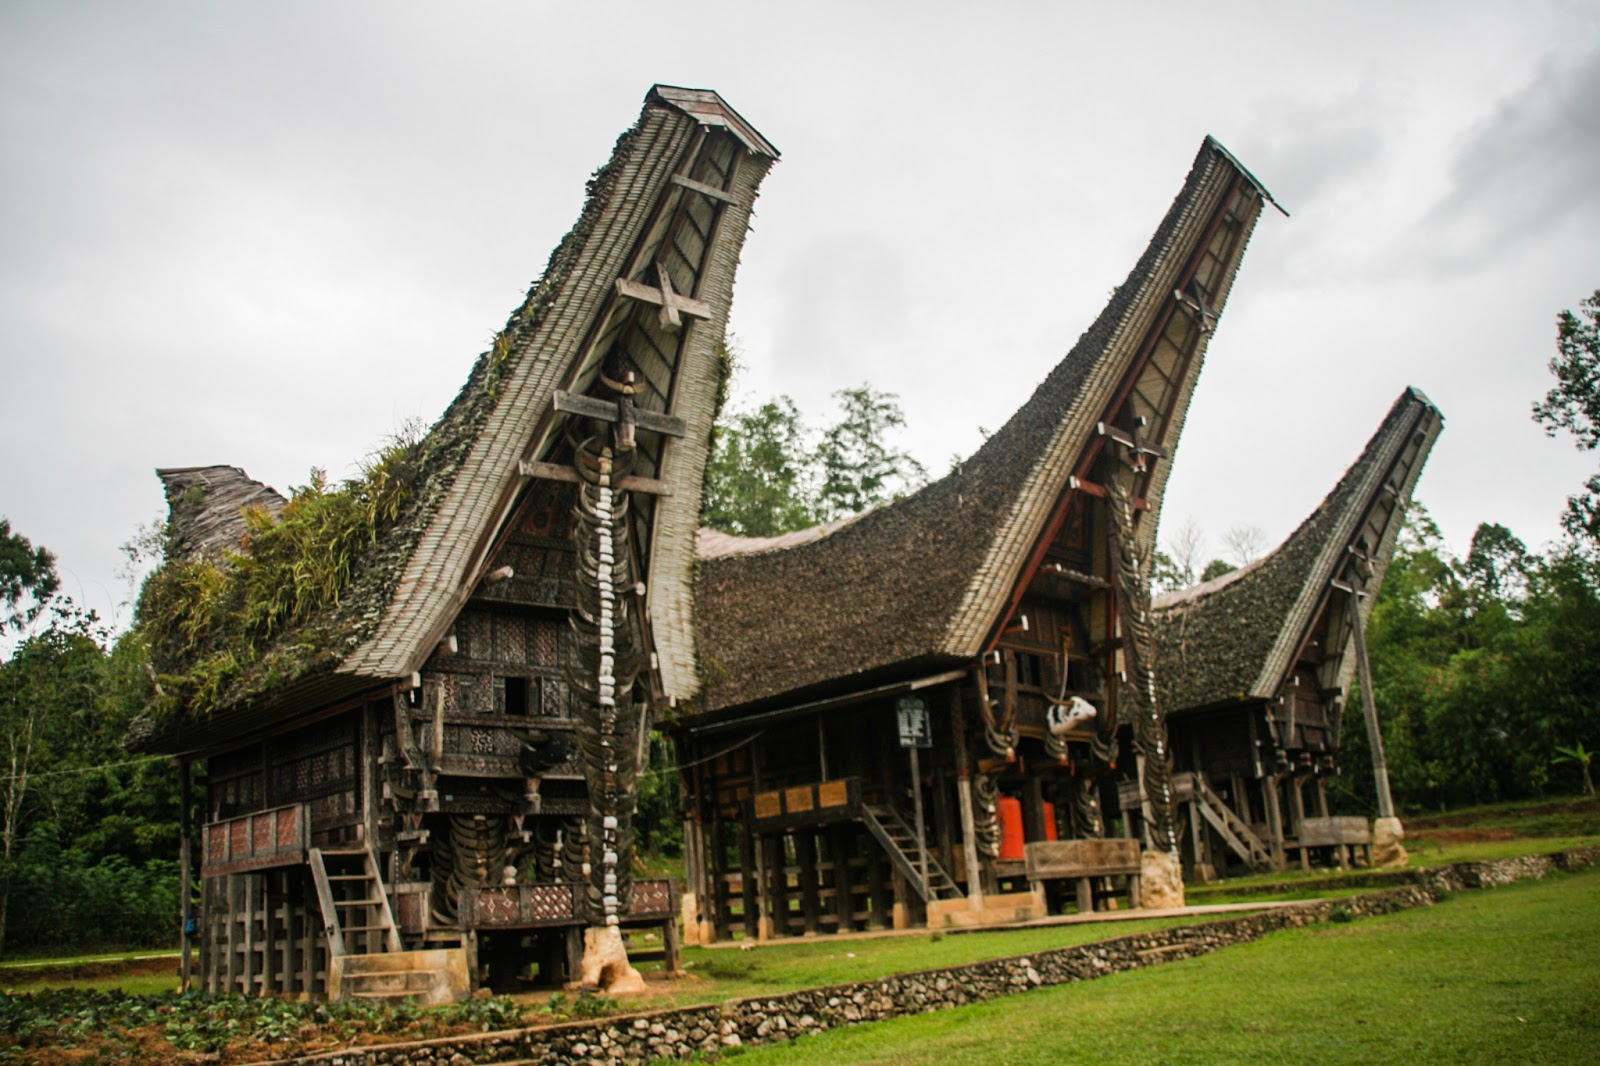 Deretan Tongkonan Karuaya. Terawat dan Asri. Jauh di pelosok Toraja.   iqbal kautsar 4920a468eb